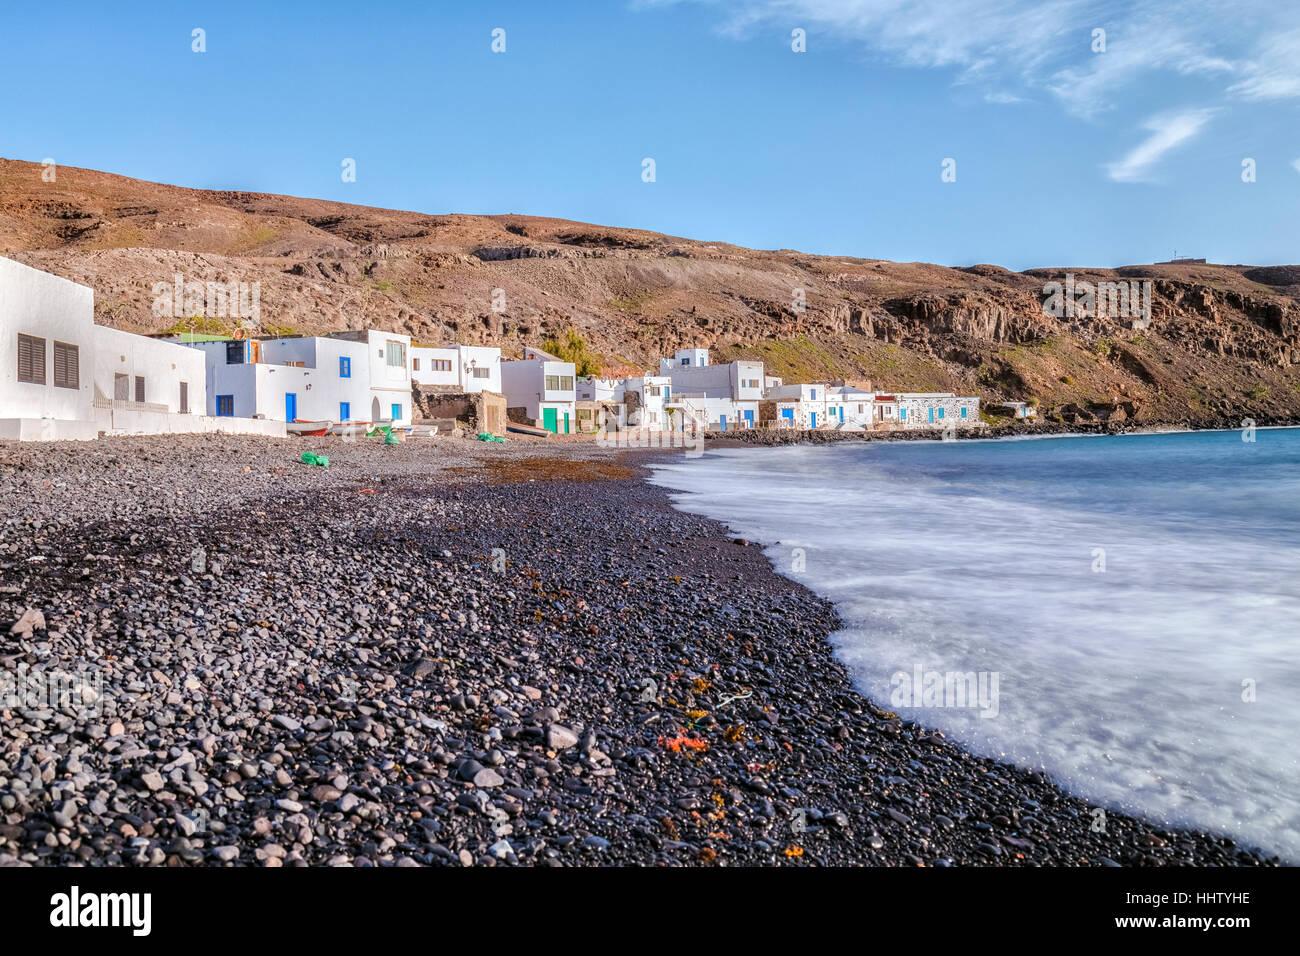 Pozo Negro, Fuerteventura, Canary Islands, Spain - Stock Image